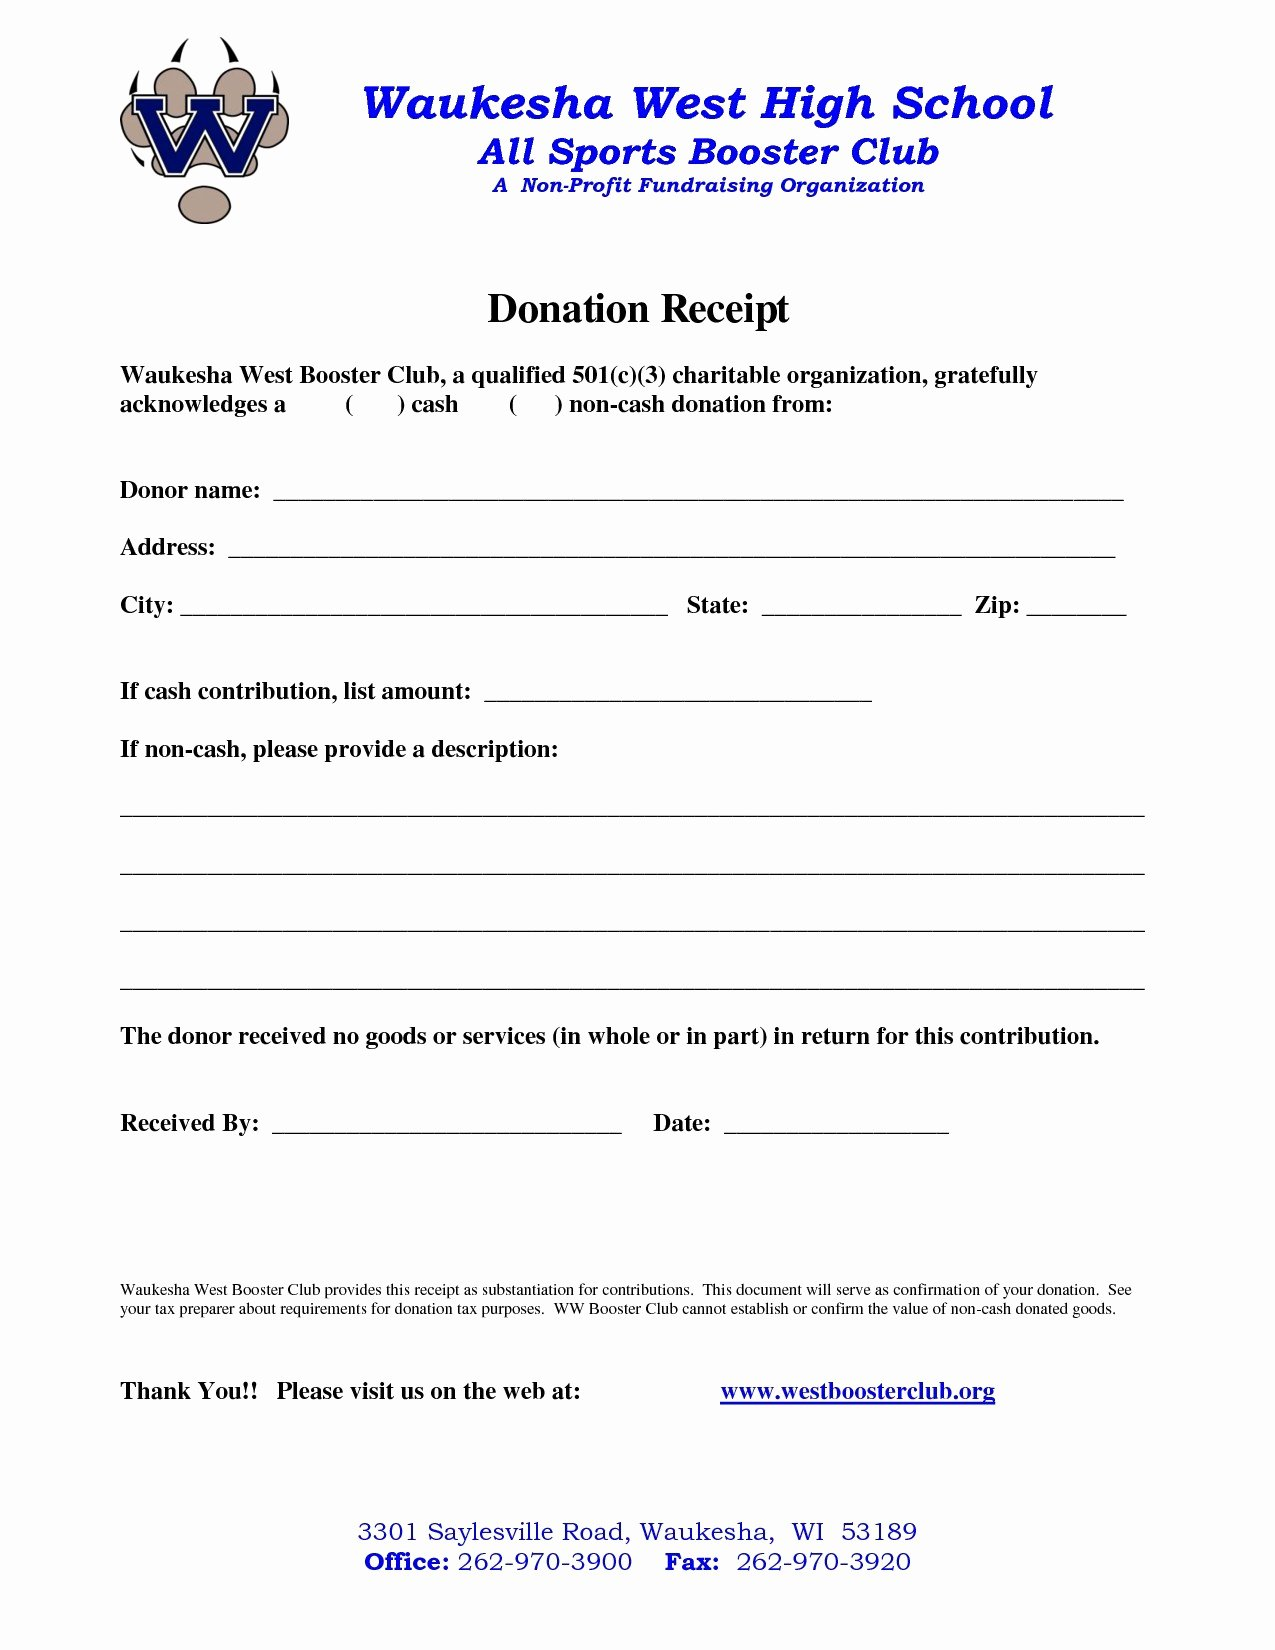 Donation Receipt Letter Template Lovely Non Profit Donation Receipt Letter Template Examples